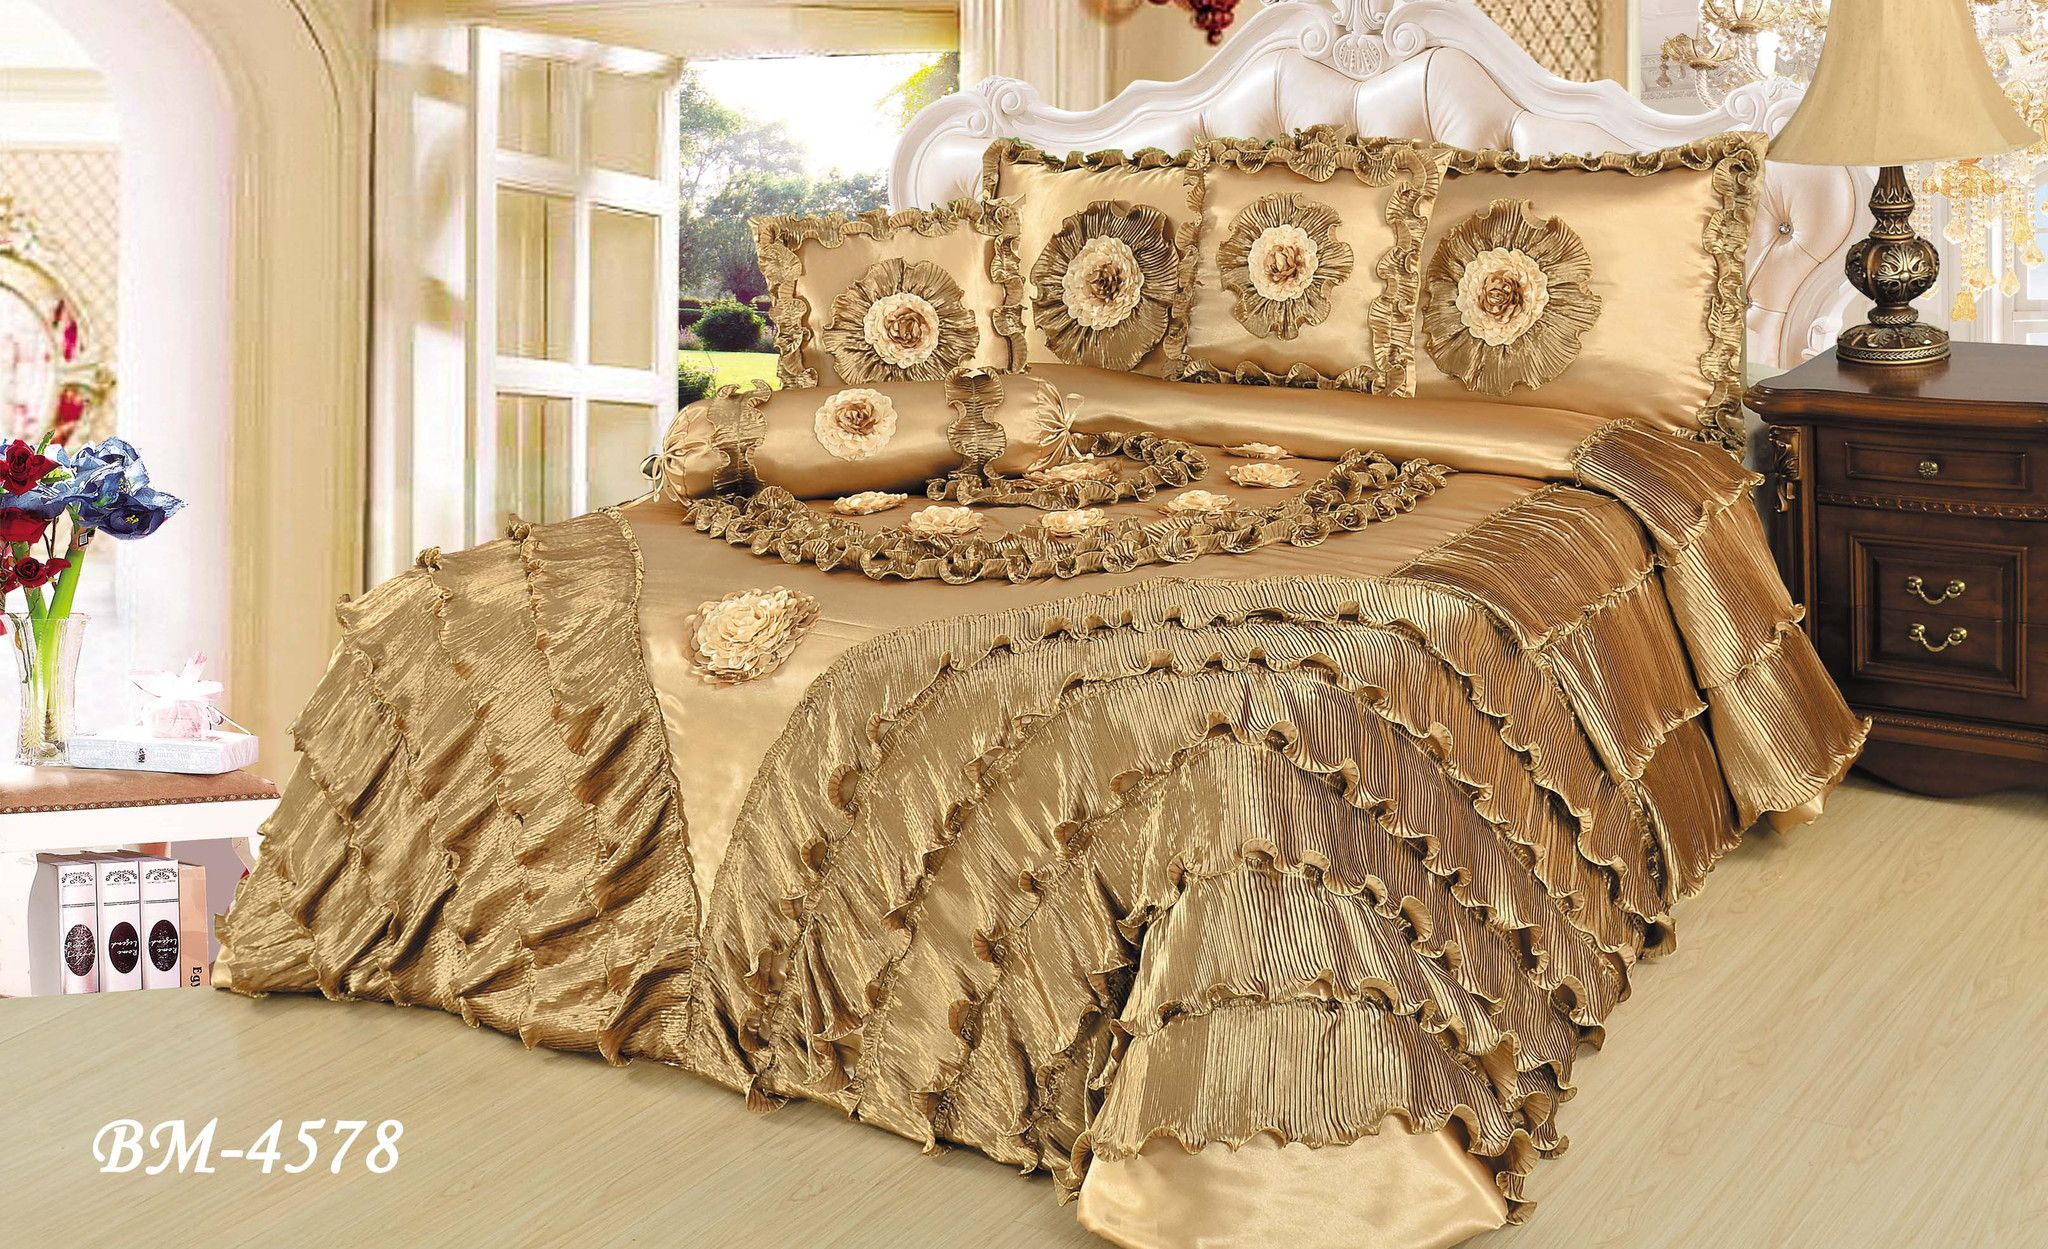 Tache Red Rose Satin Ruffle Floral Christmas Wedding Comforter Quilt Bedding Set